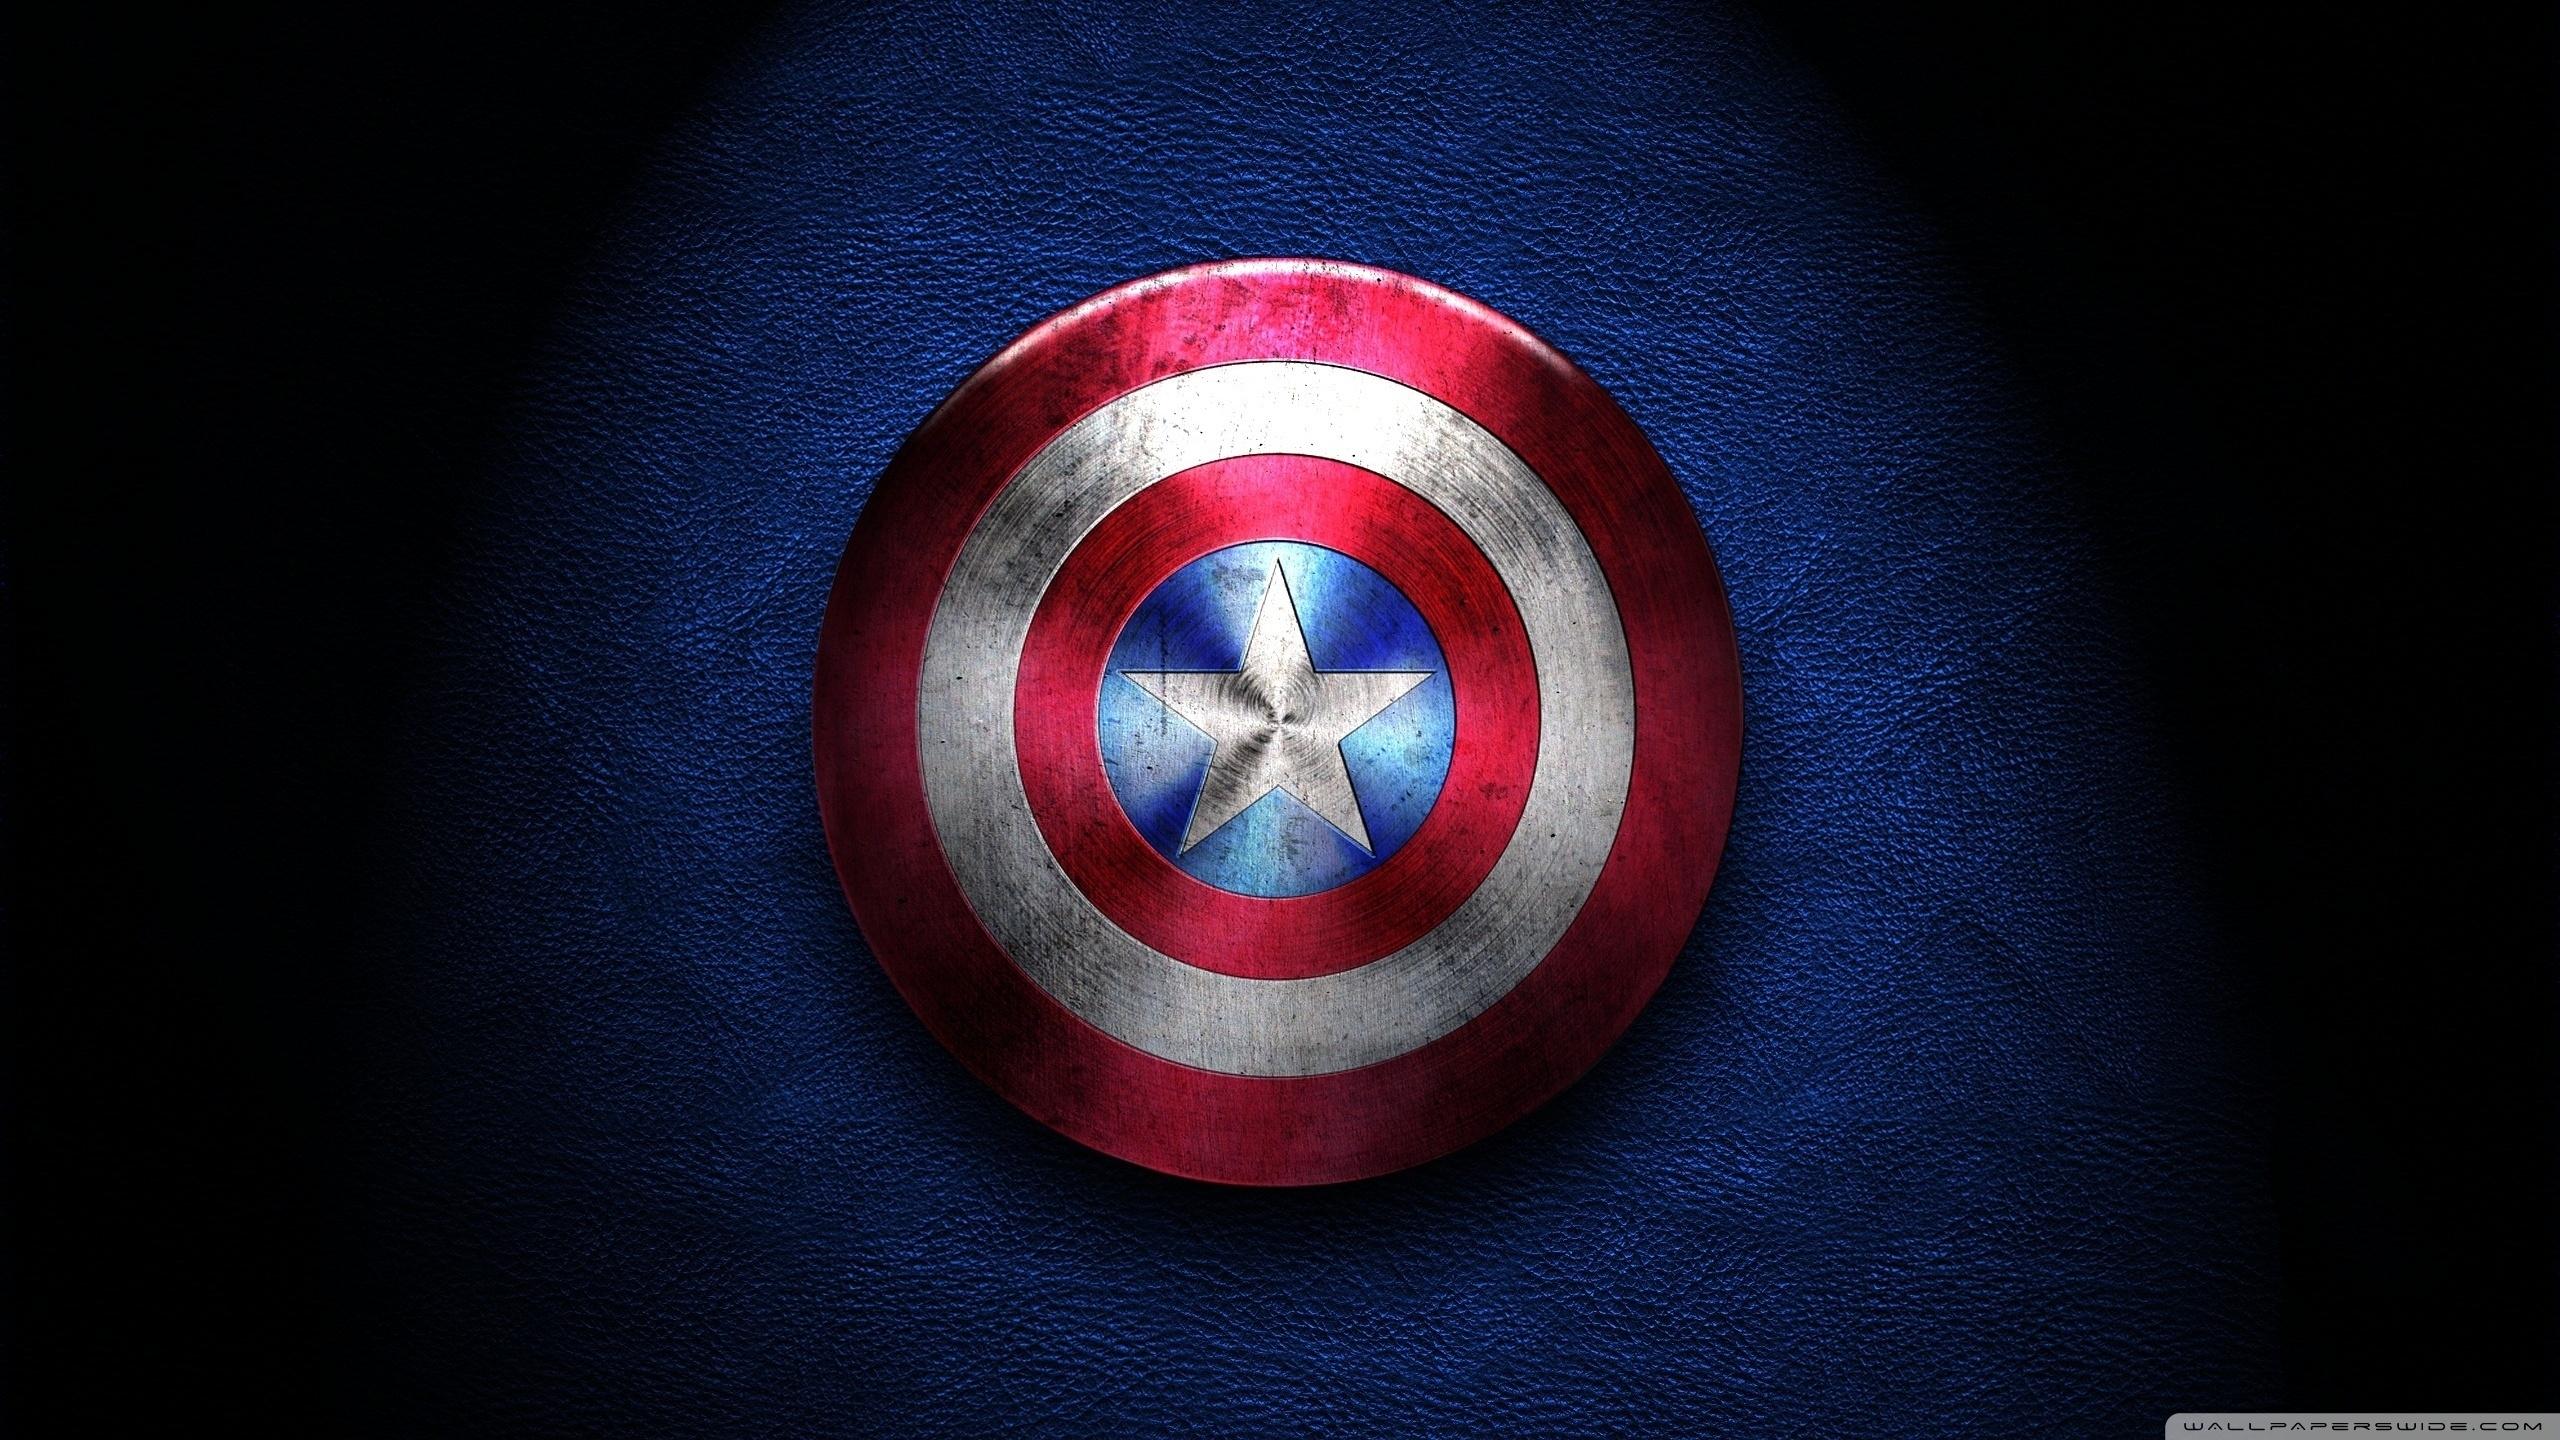 captain america shield ❤ 4k hd desktop wallpaper for 4k ultra hd tv